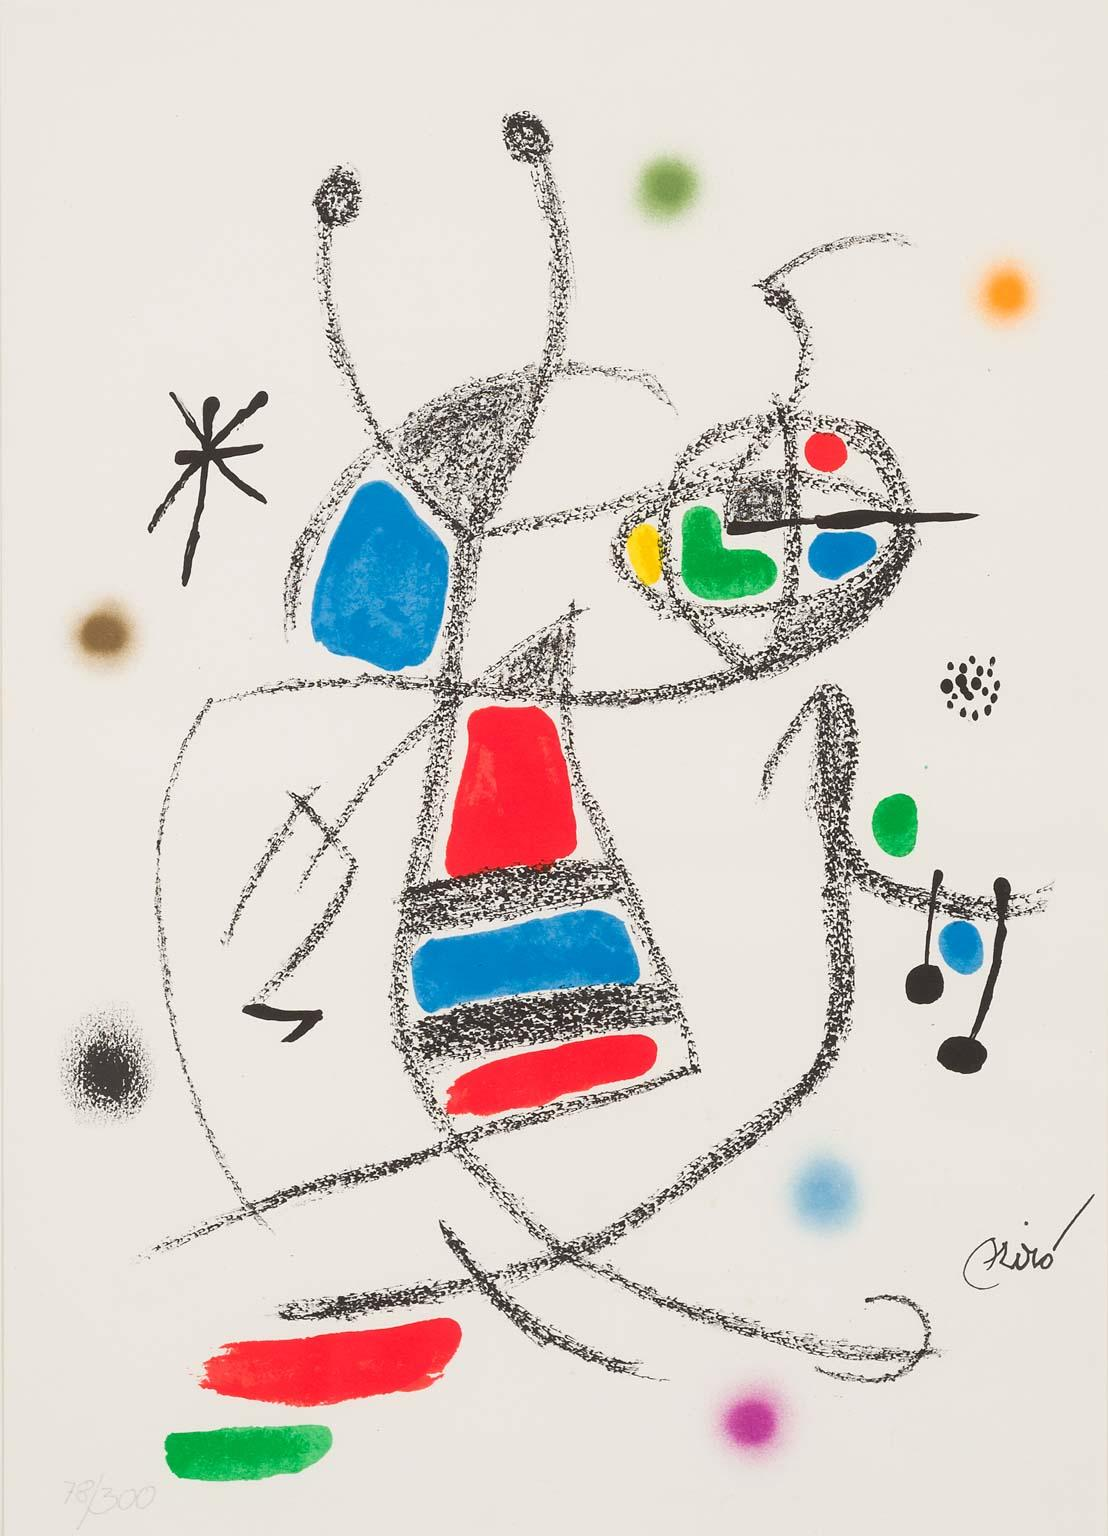 Jardin de Miró - original modern lithograph from Miró magical realism